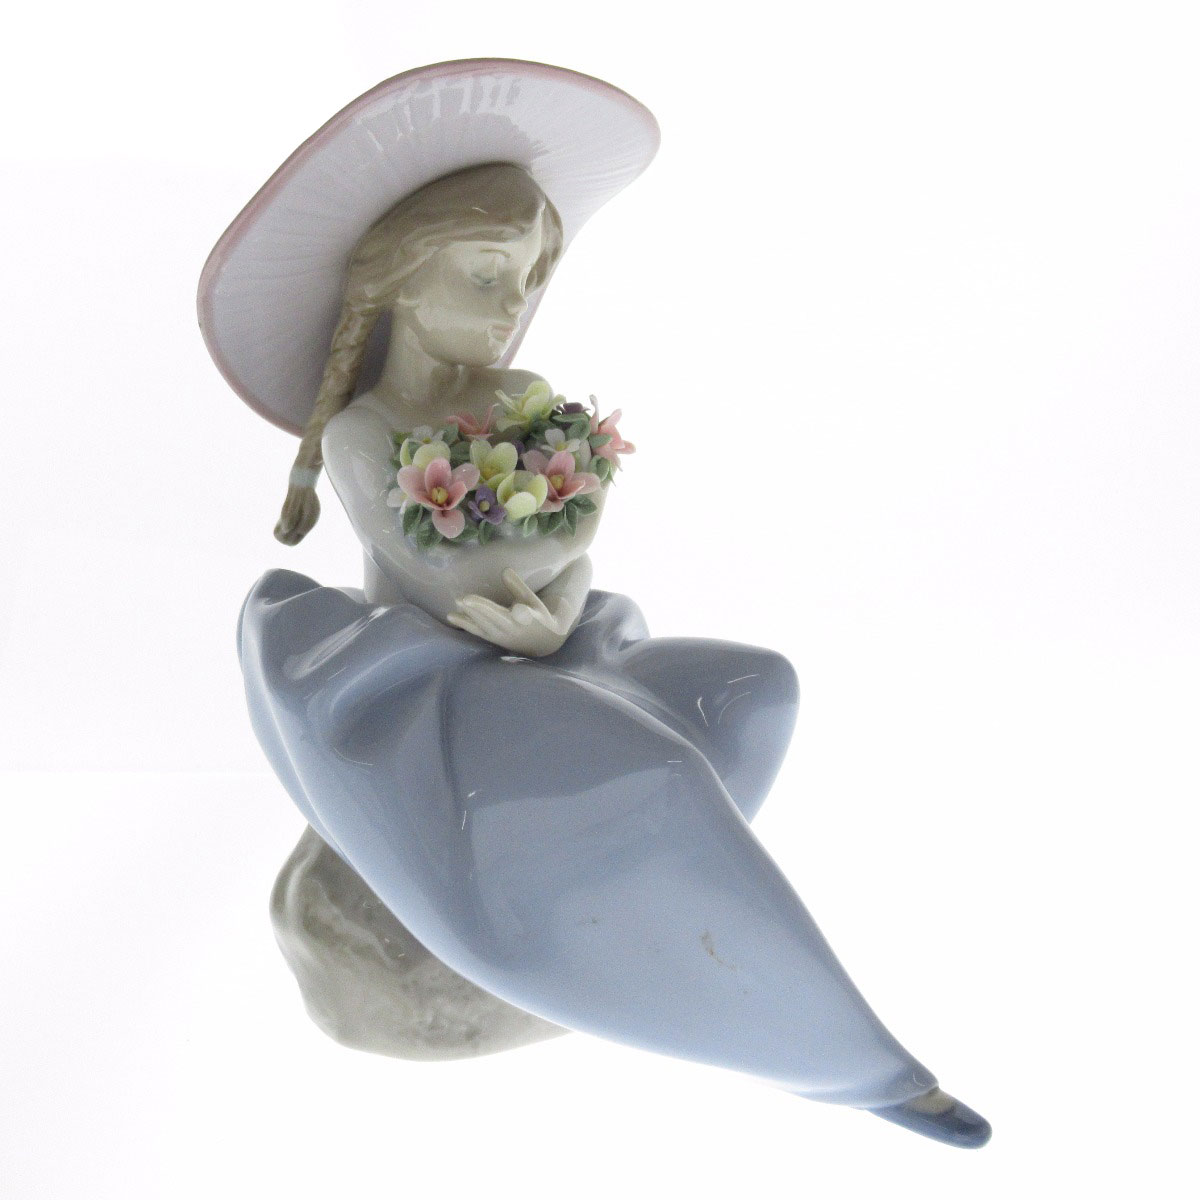 Lladro 花の香りに包まれて オブジェ 陶磁器 レディース 【中古】【リヤドロ】